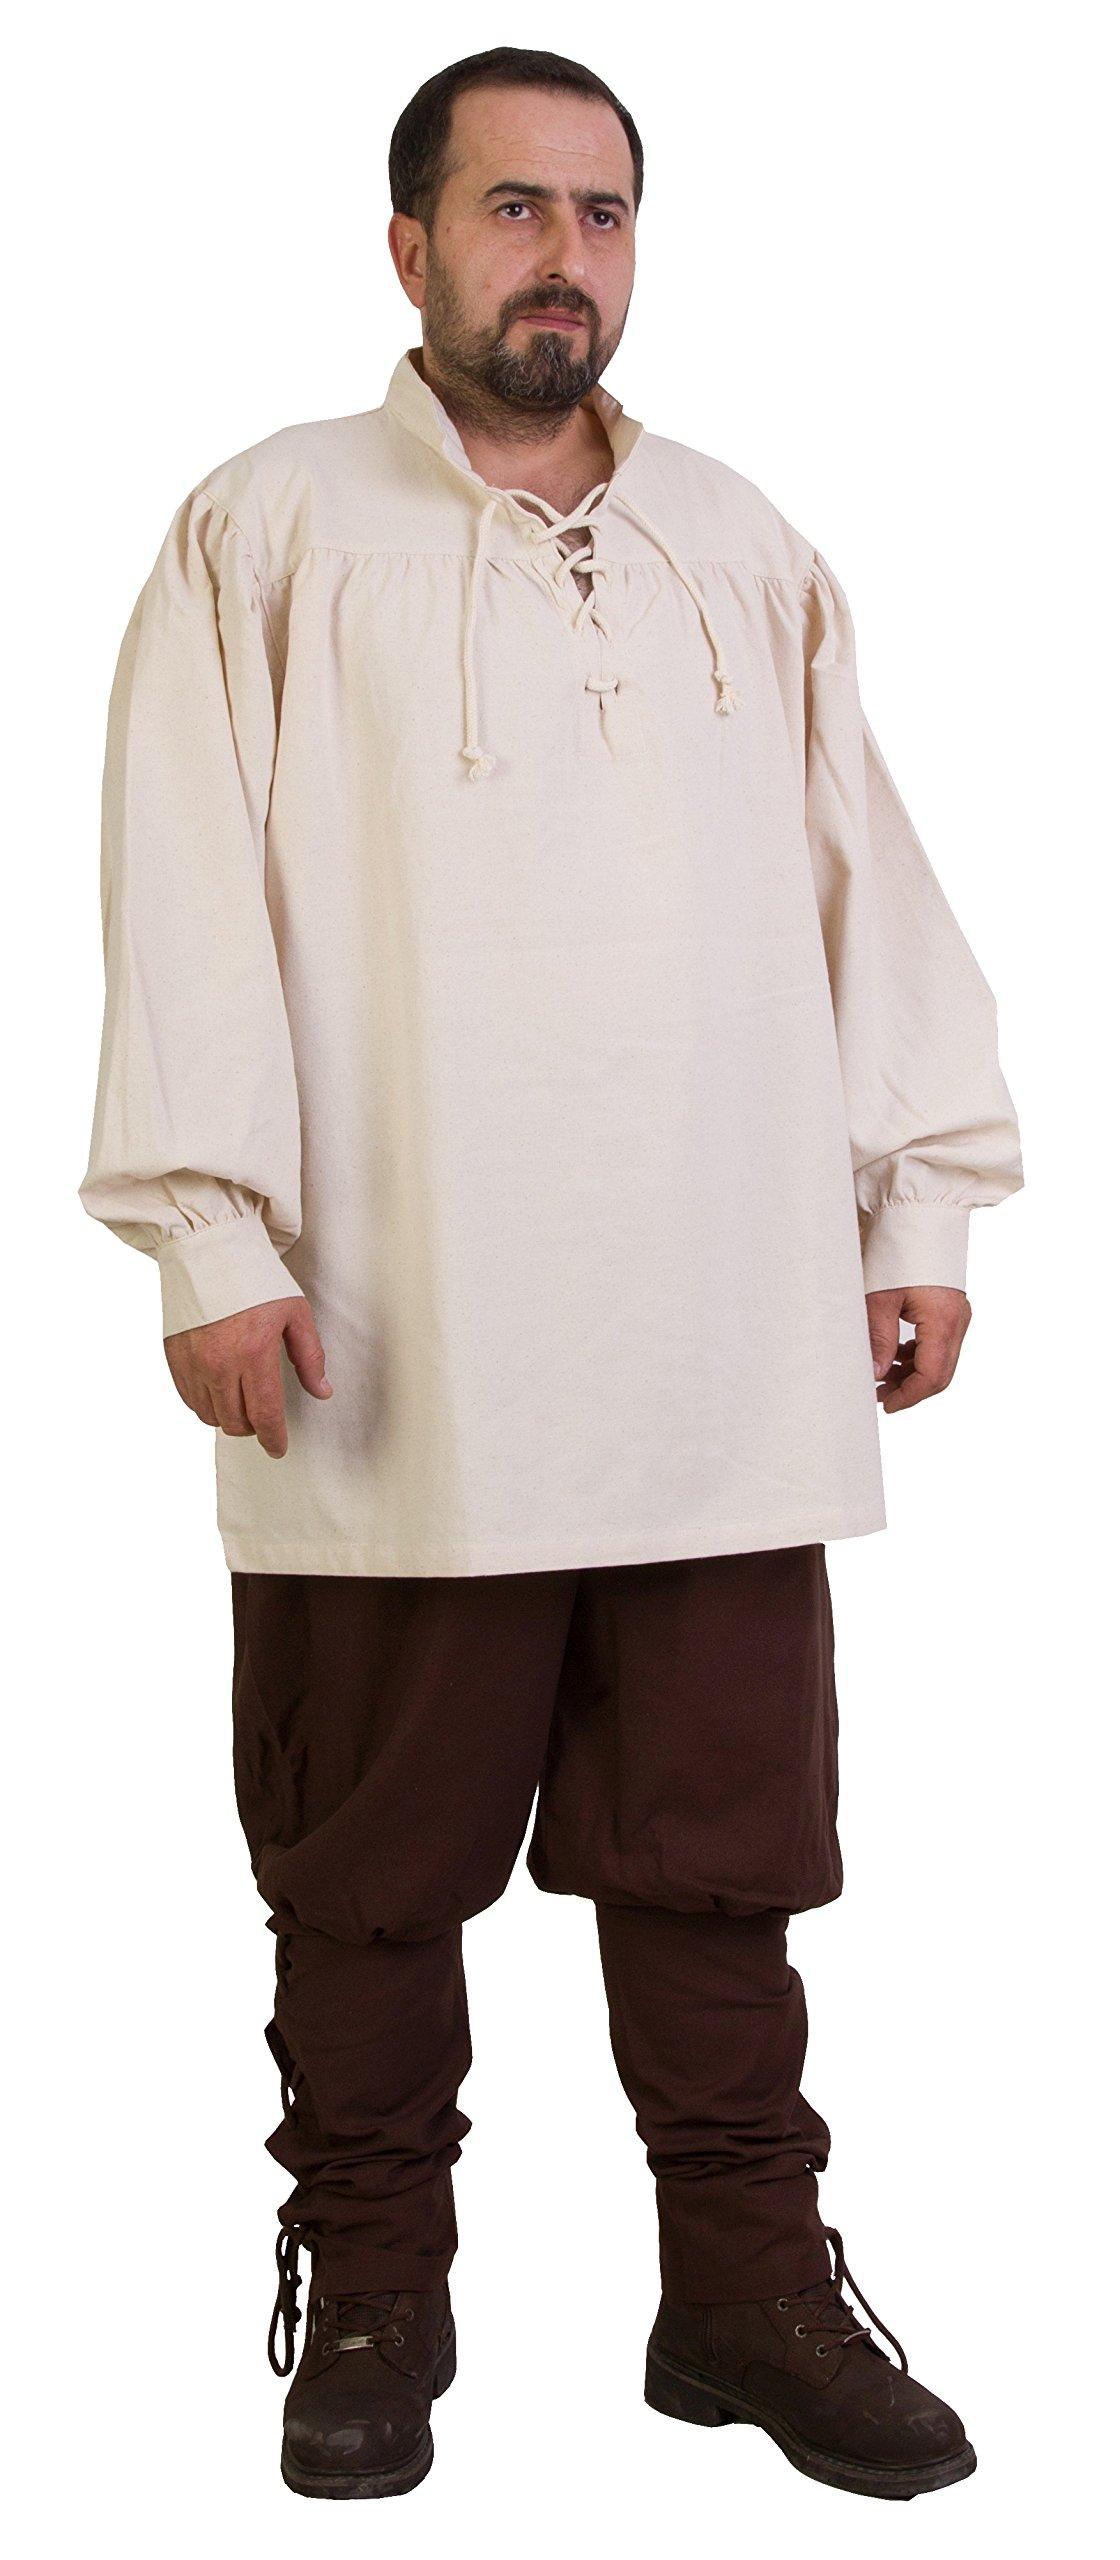 byCalvina - Calvina Costumes ERMES Medieval Viking LARP Pirate Cotton Man Shirt - Made in Turkey-Nat-2XL by byCalvina - Calvina Costumes (Image #3)